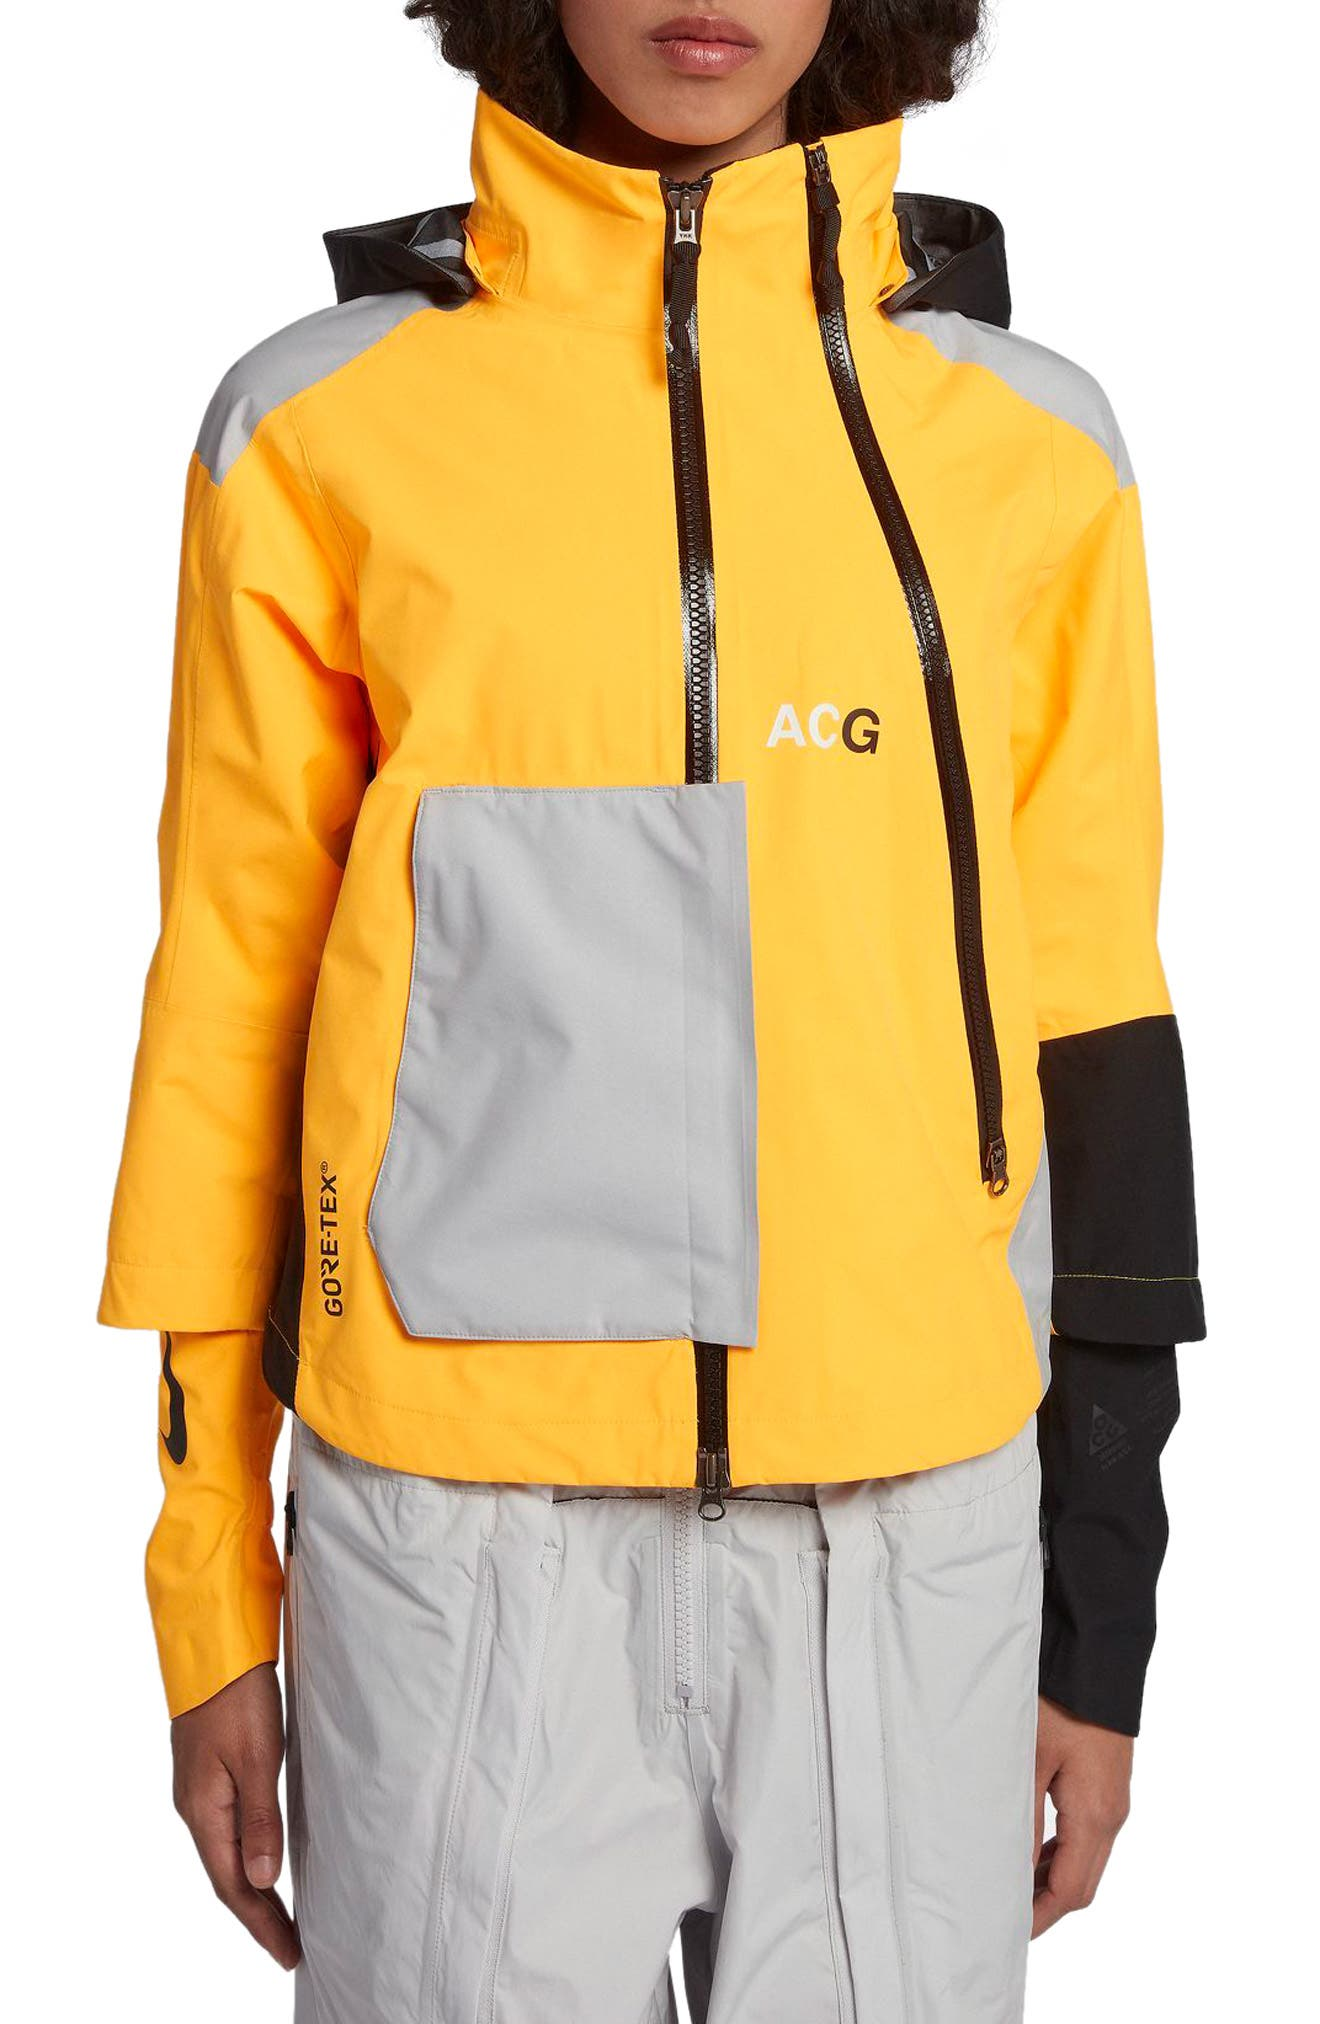 NikeLab ACG Gore-Tex<sup>®</sup> Women's Jacket,                             Main thumbnail 3, color,